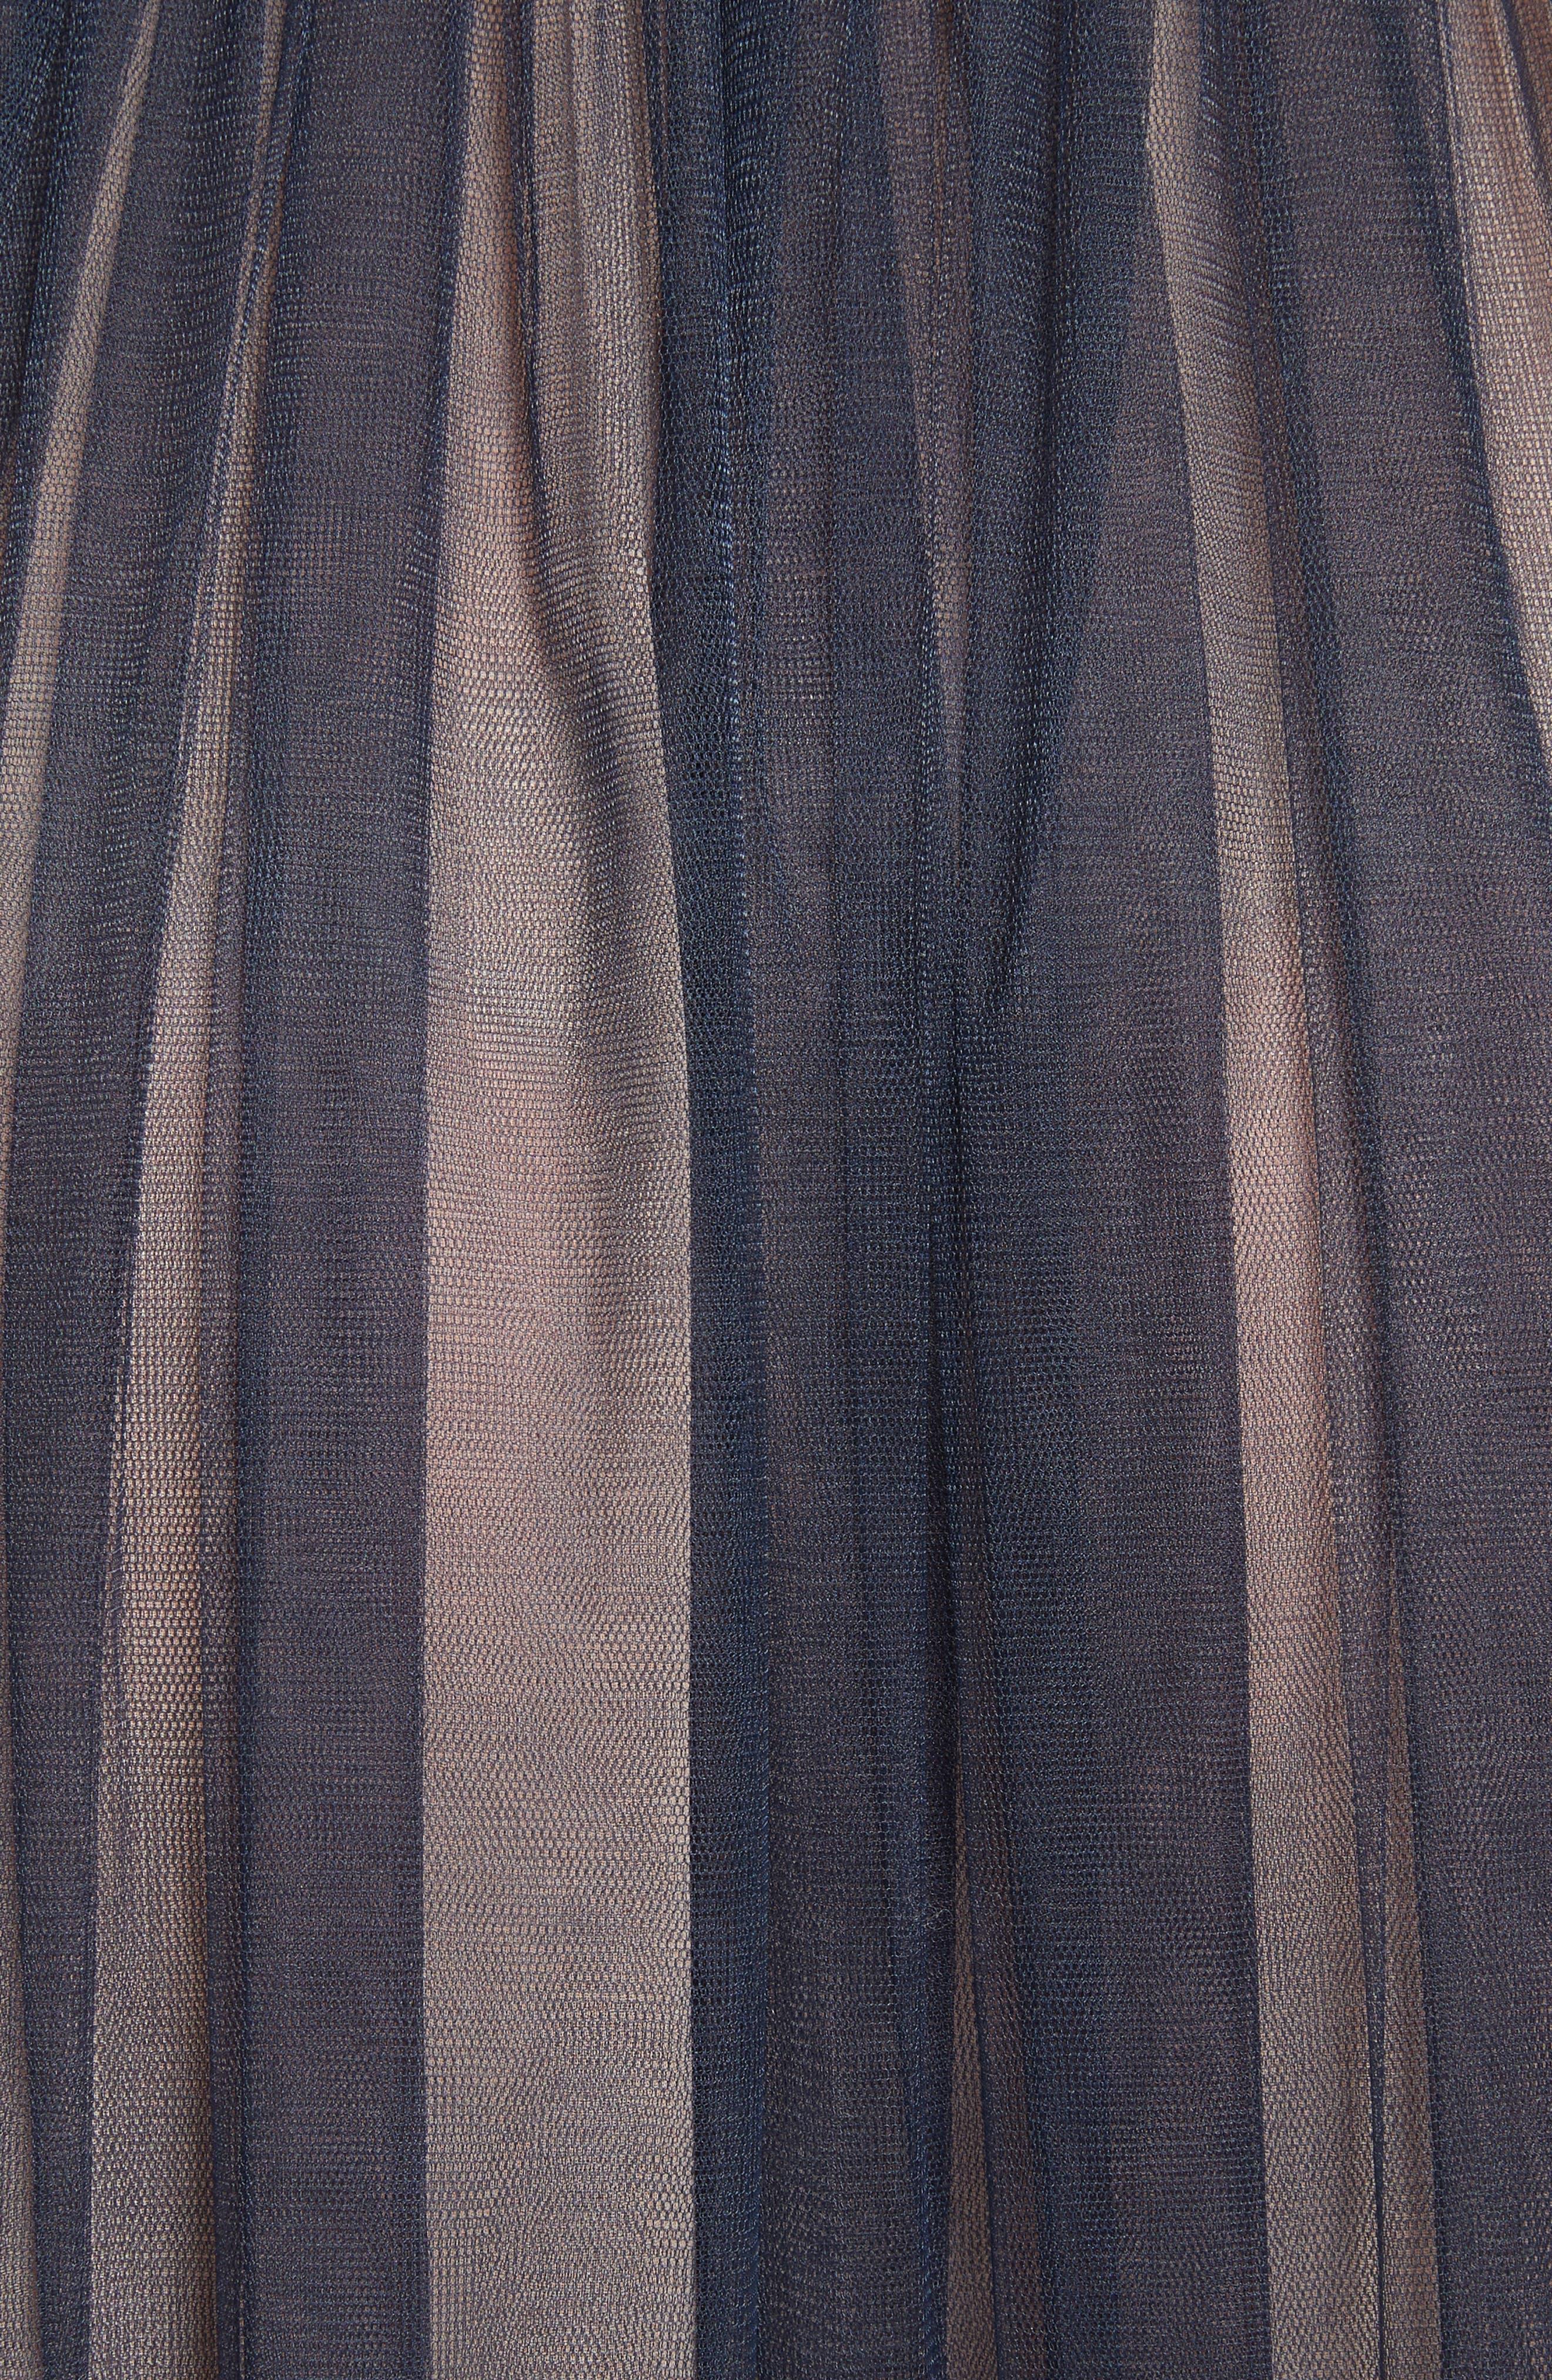 Coletta Asymmetrical Tulle Dress,                             Alternate thumbnail 5, color,                             Navy